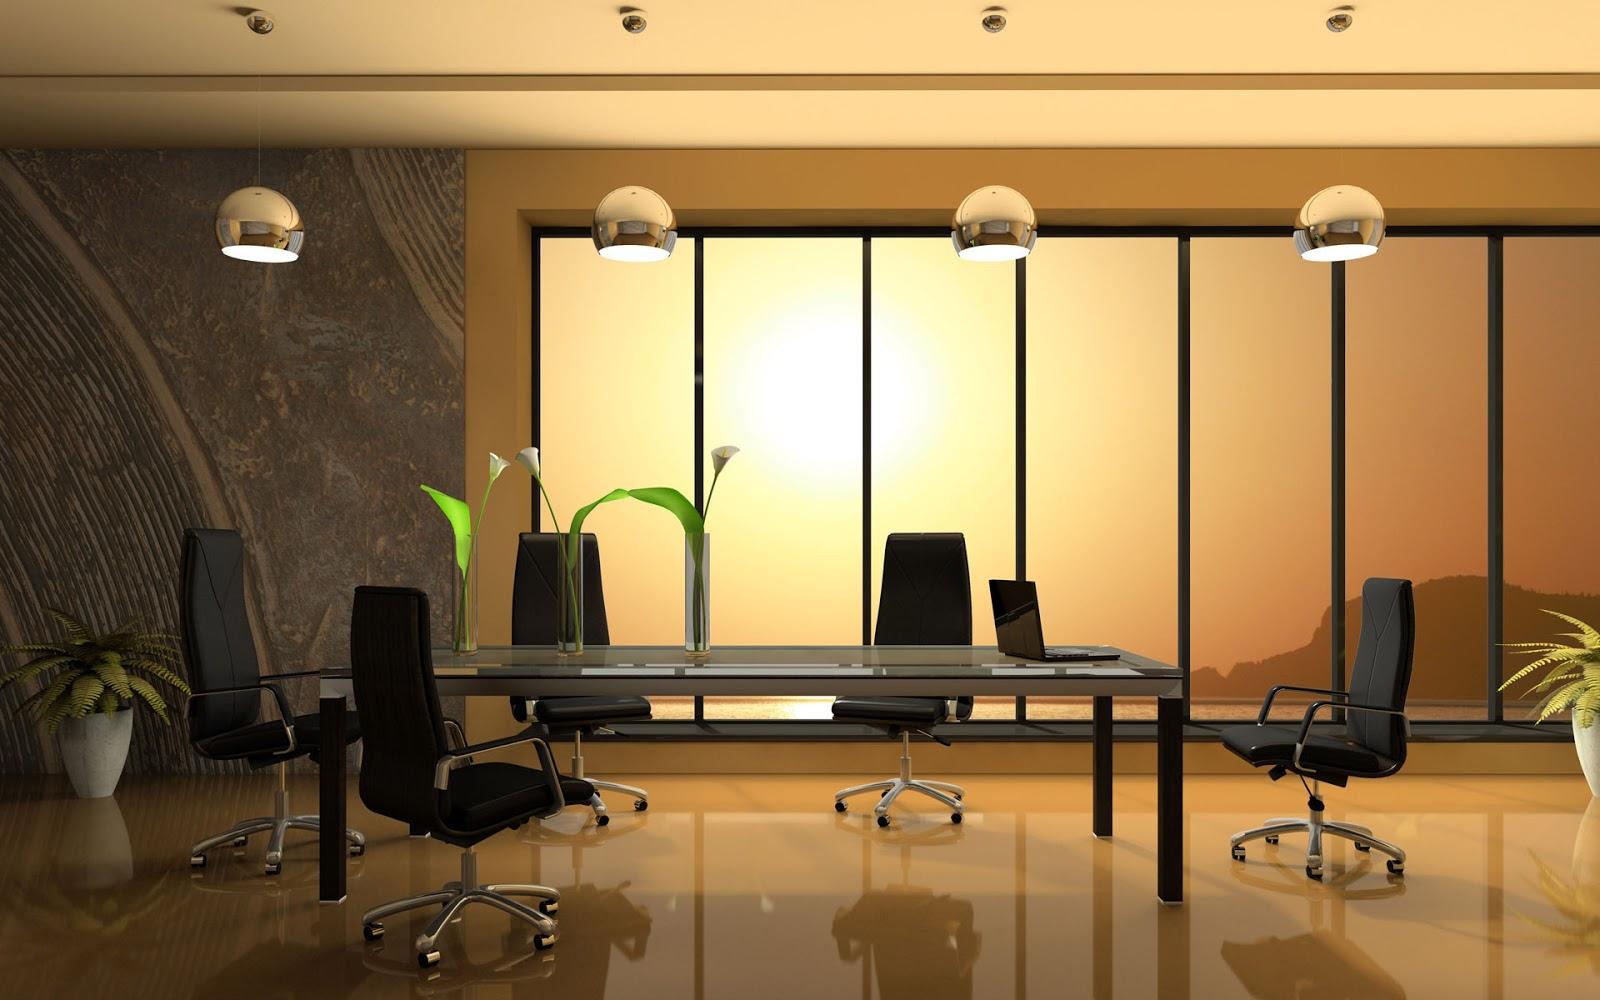 50 Interior Design Hd Wallpapers On Wallpapersafari